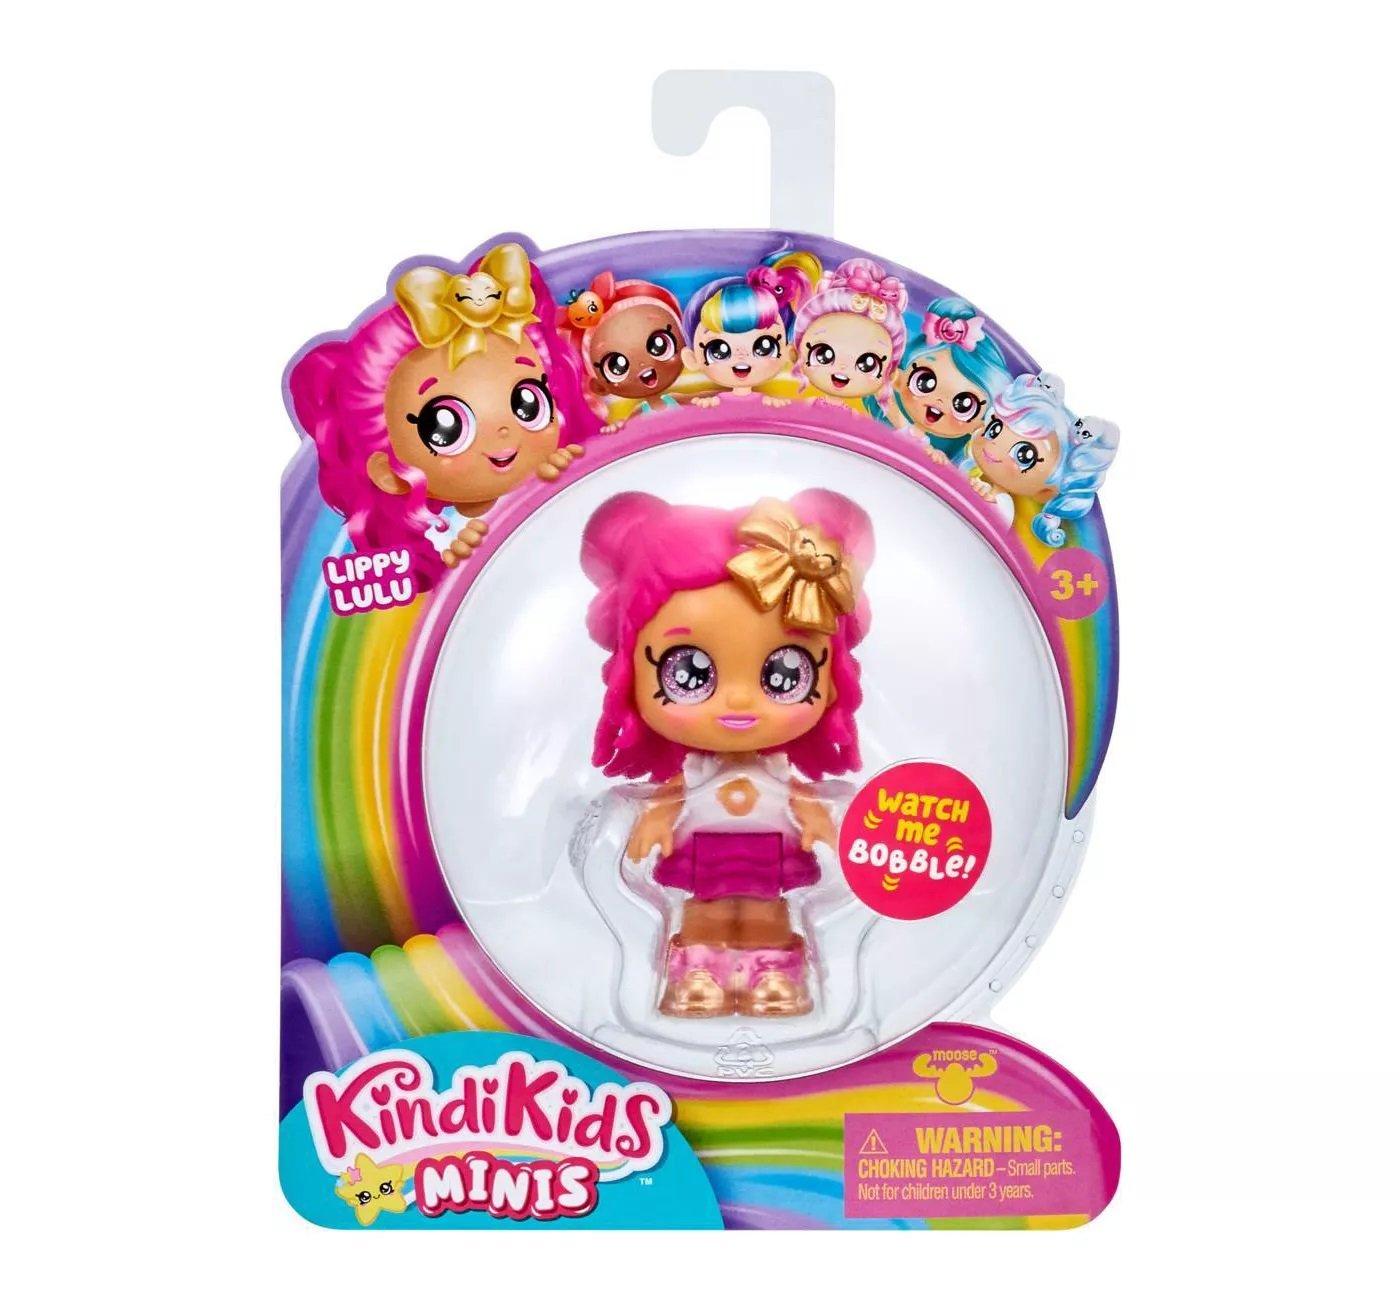 Kindi Kids Minis 娃娃 Lippy Lulu